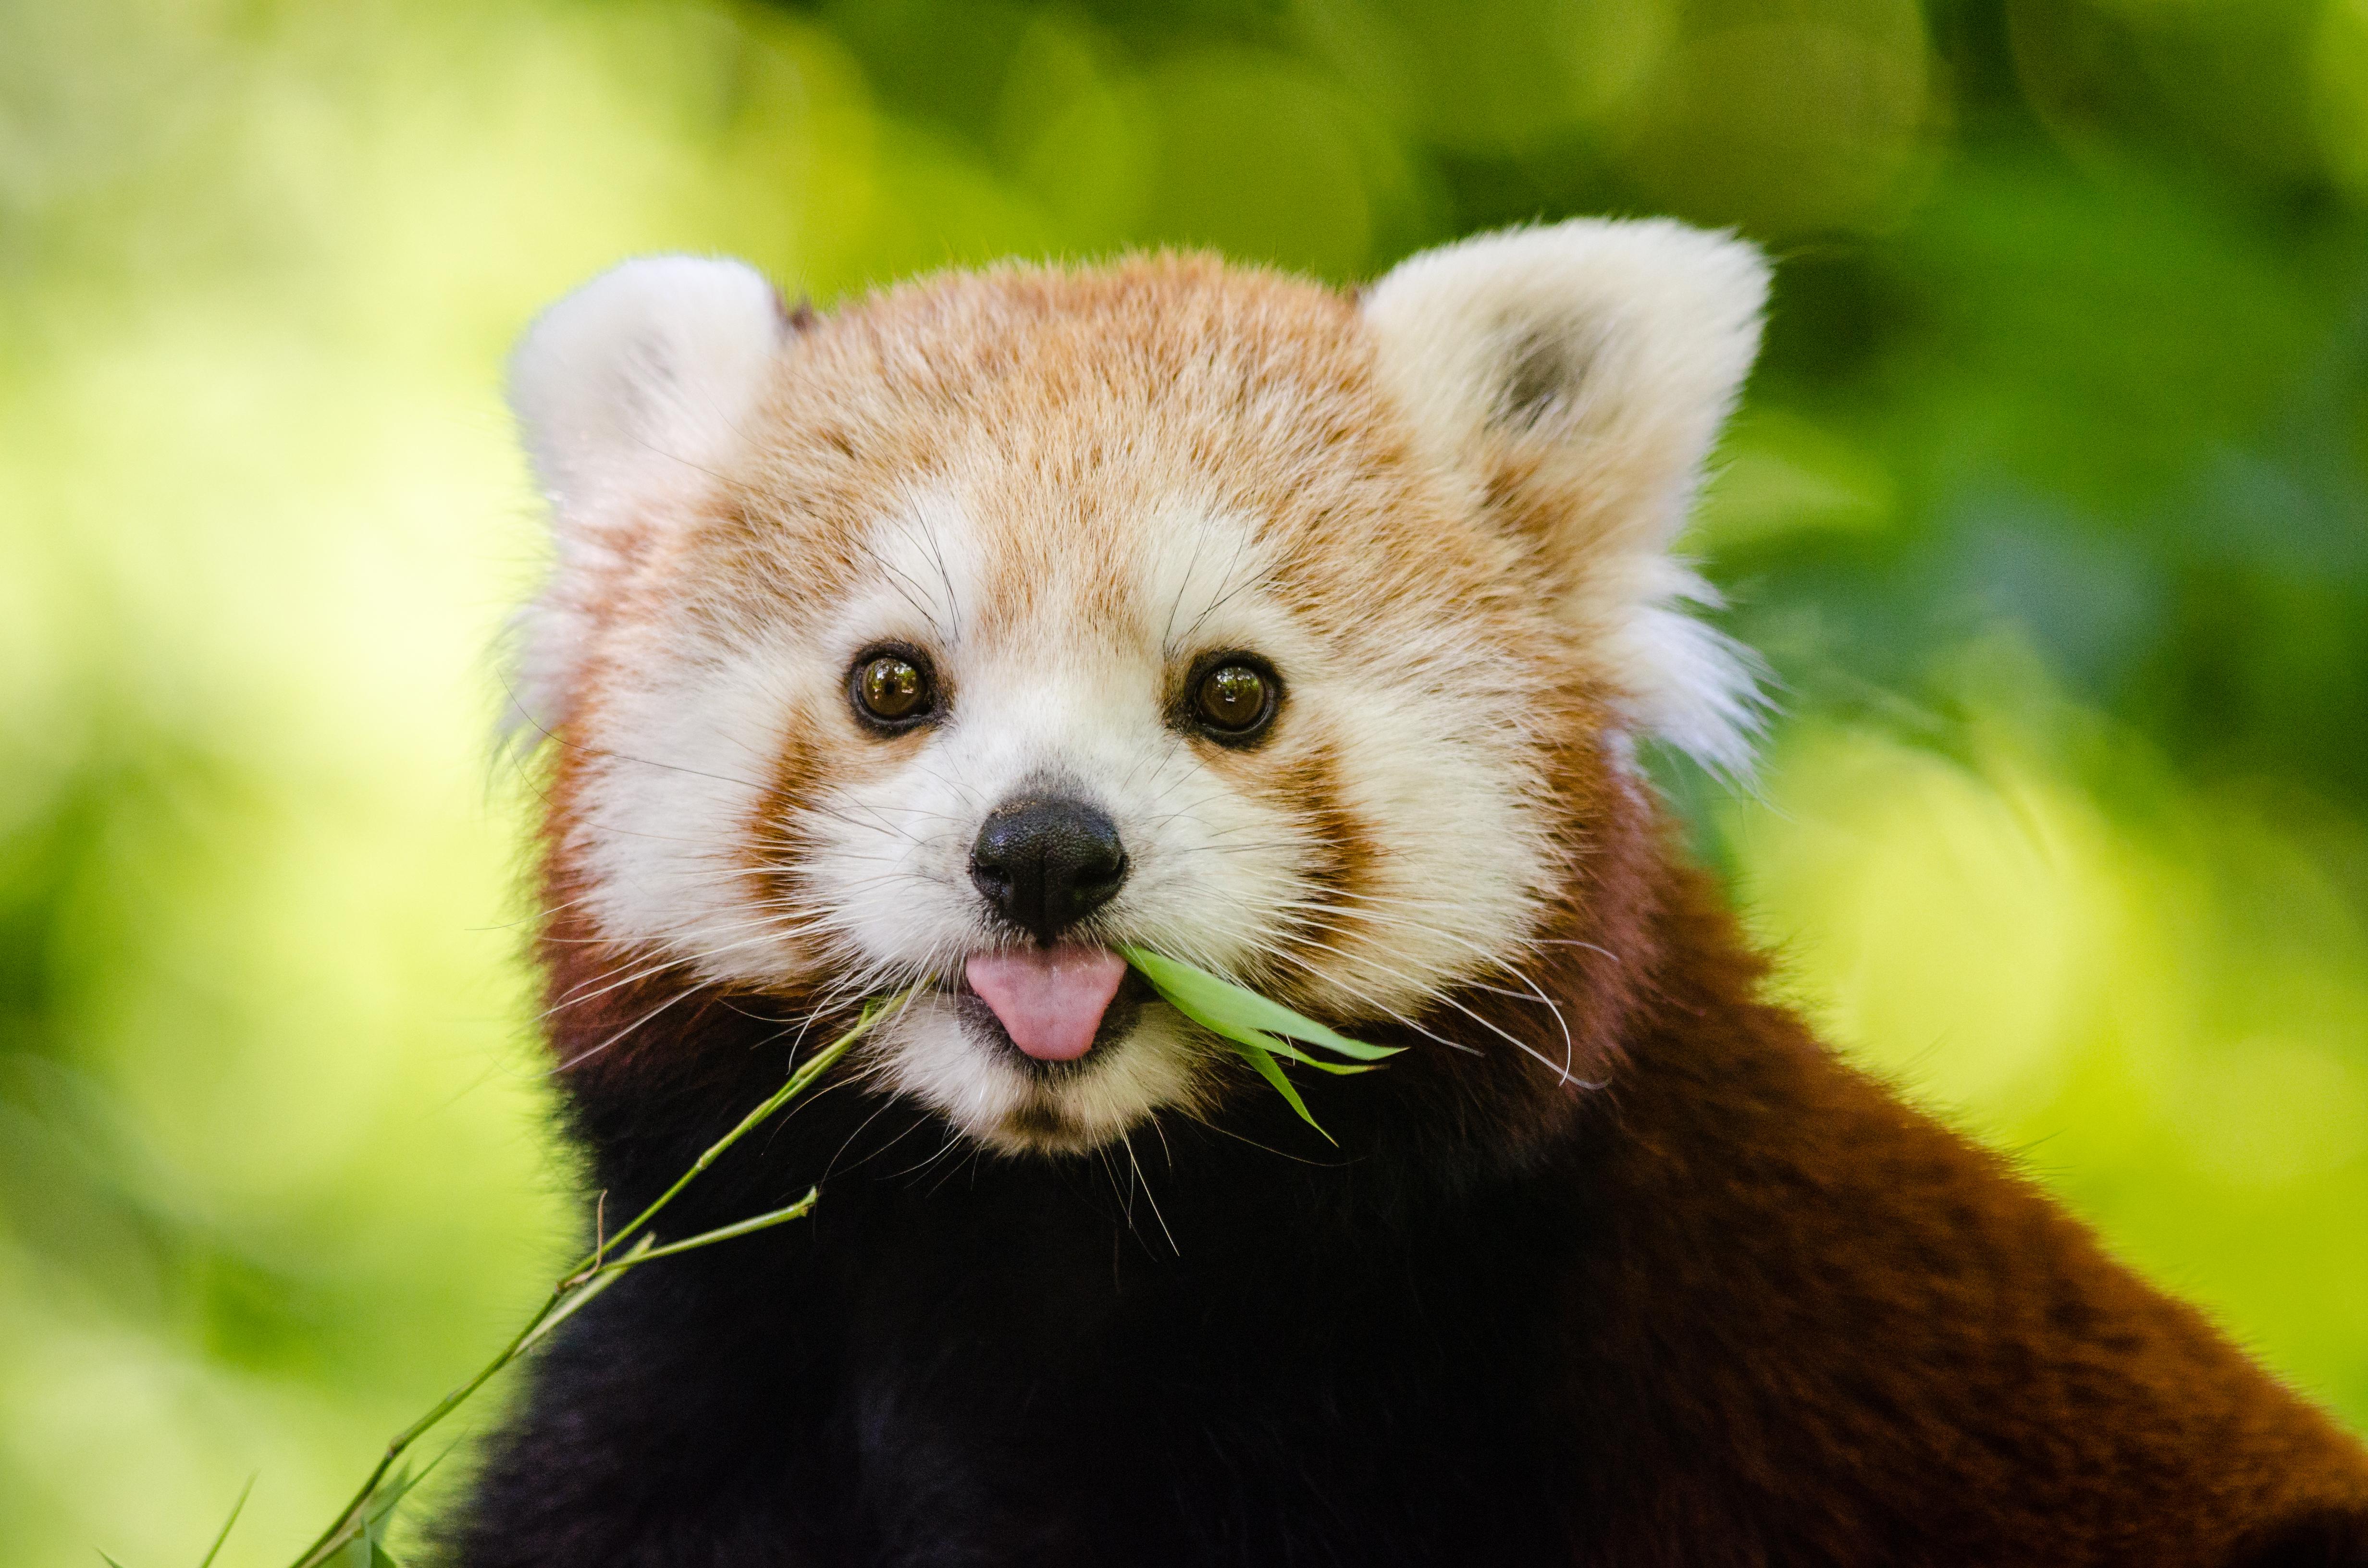 animal pictures pexels free stock photos